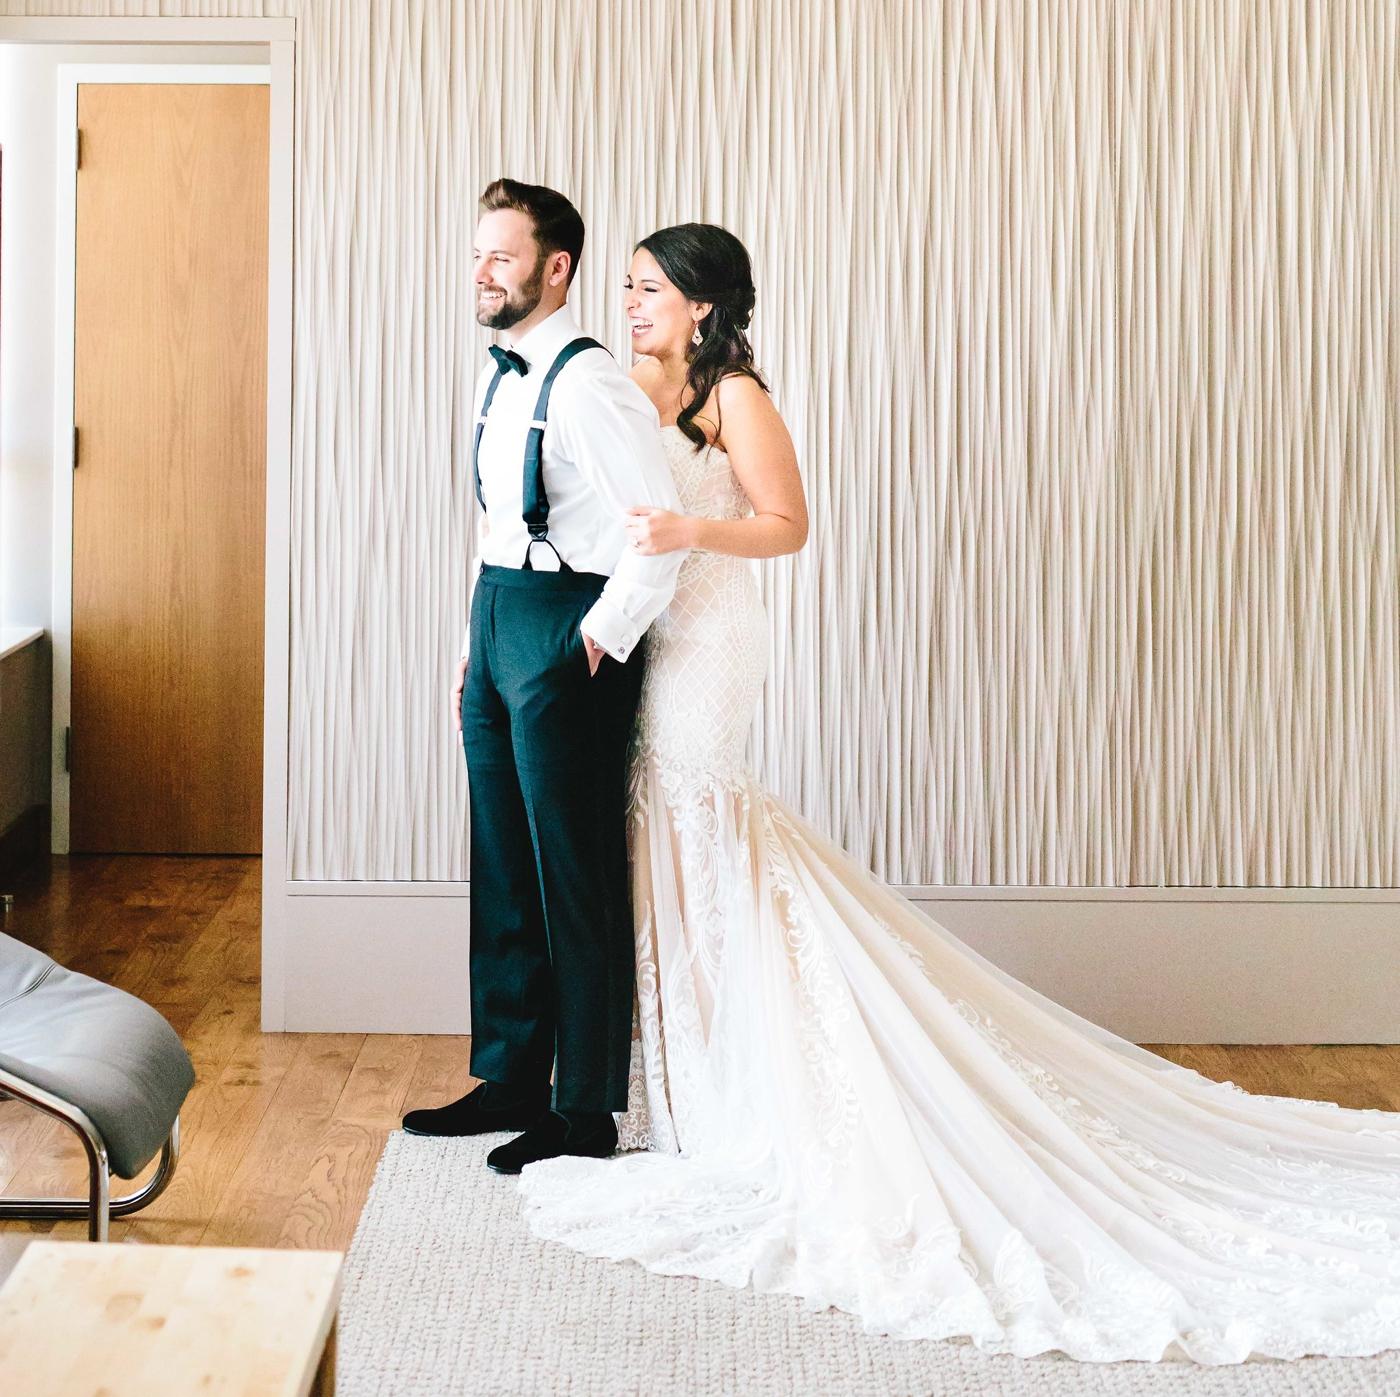 chicago-fine-art-wedding-photography-douglas25